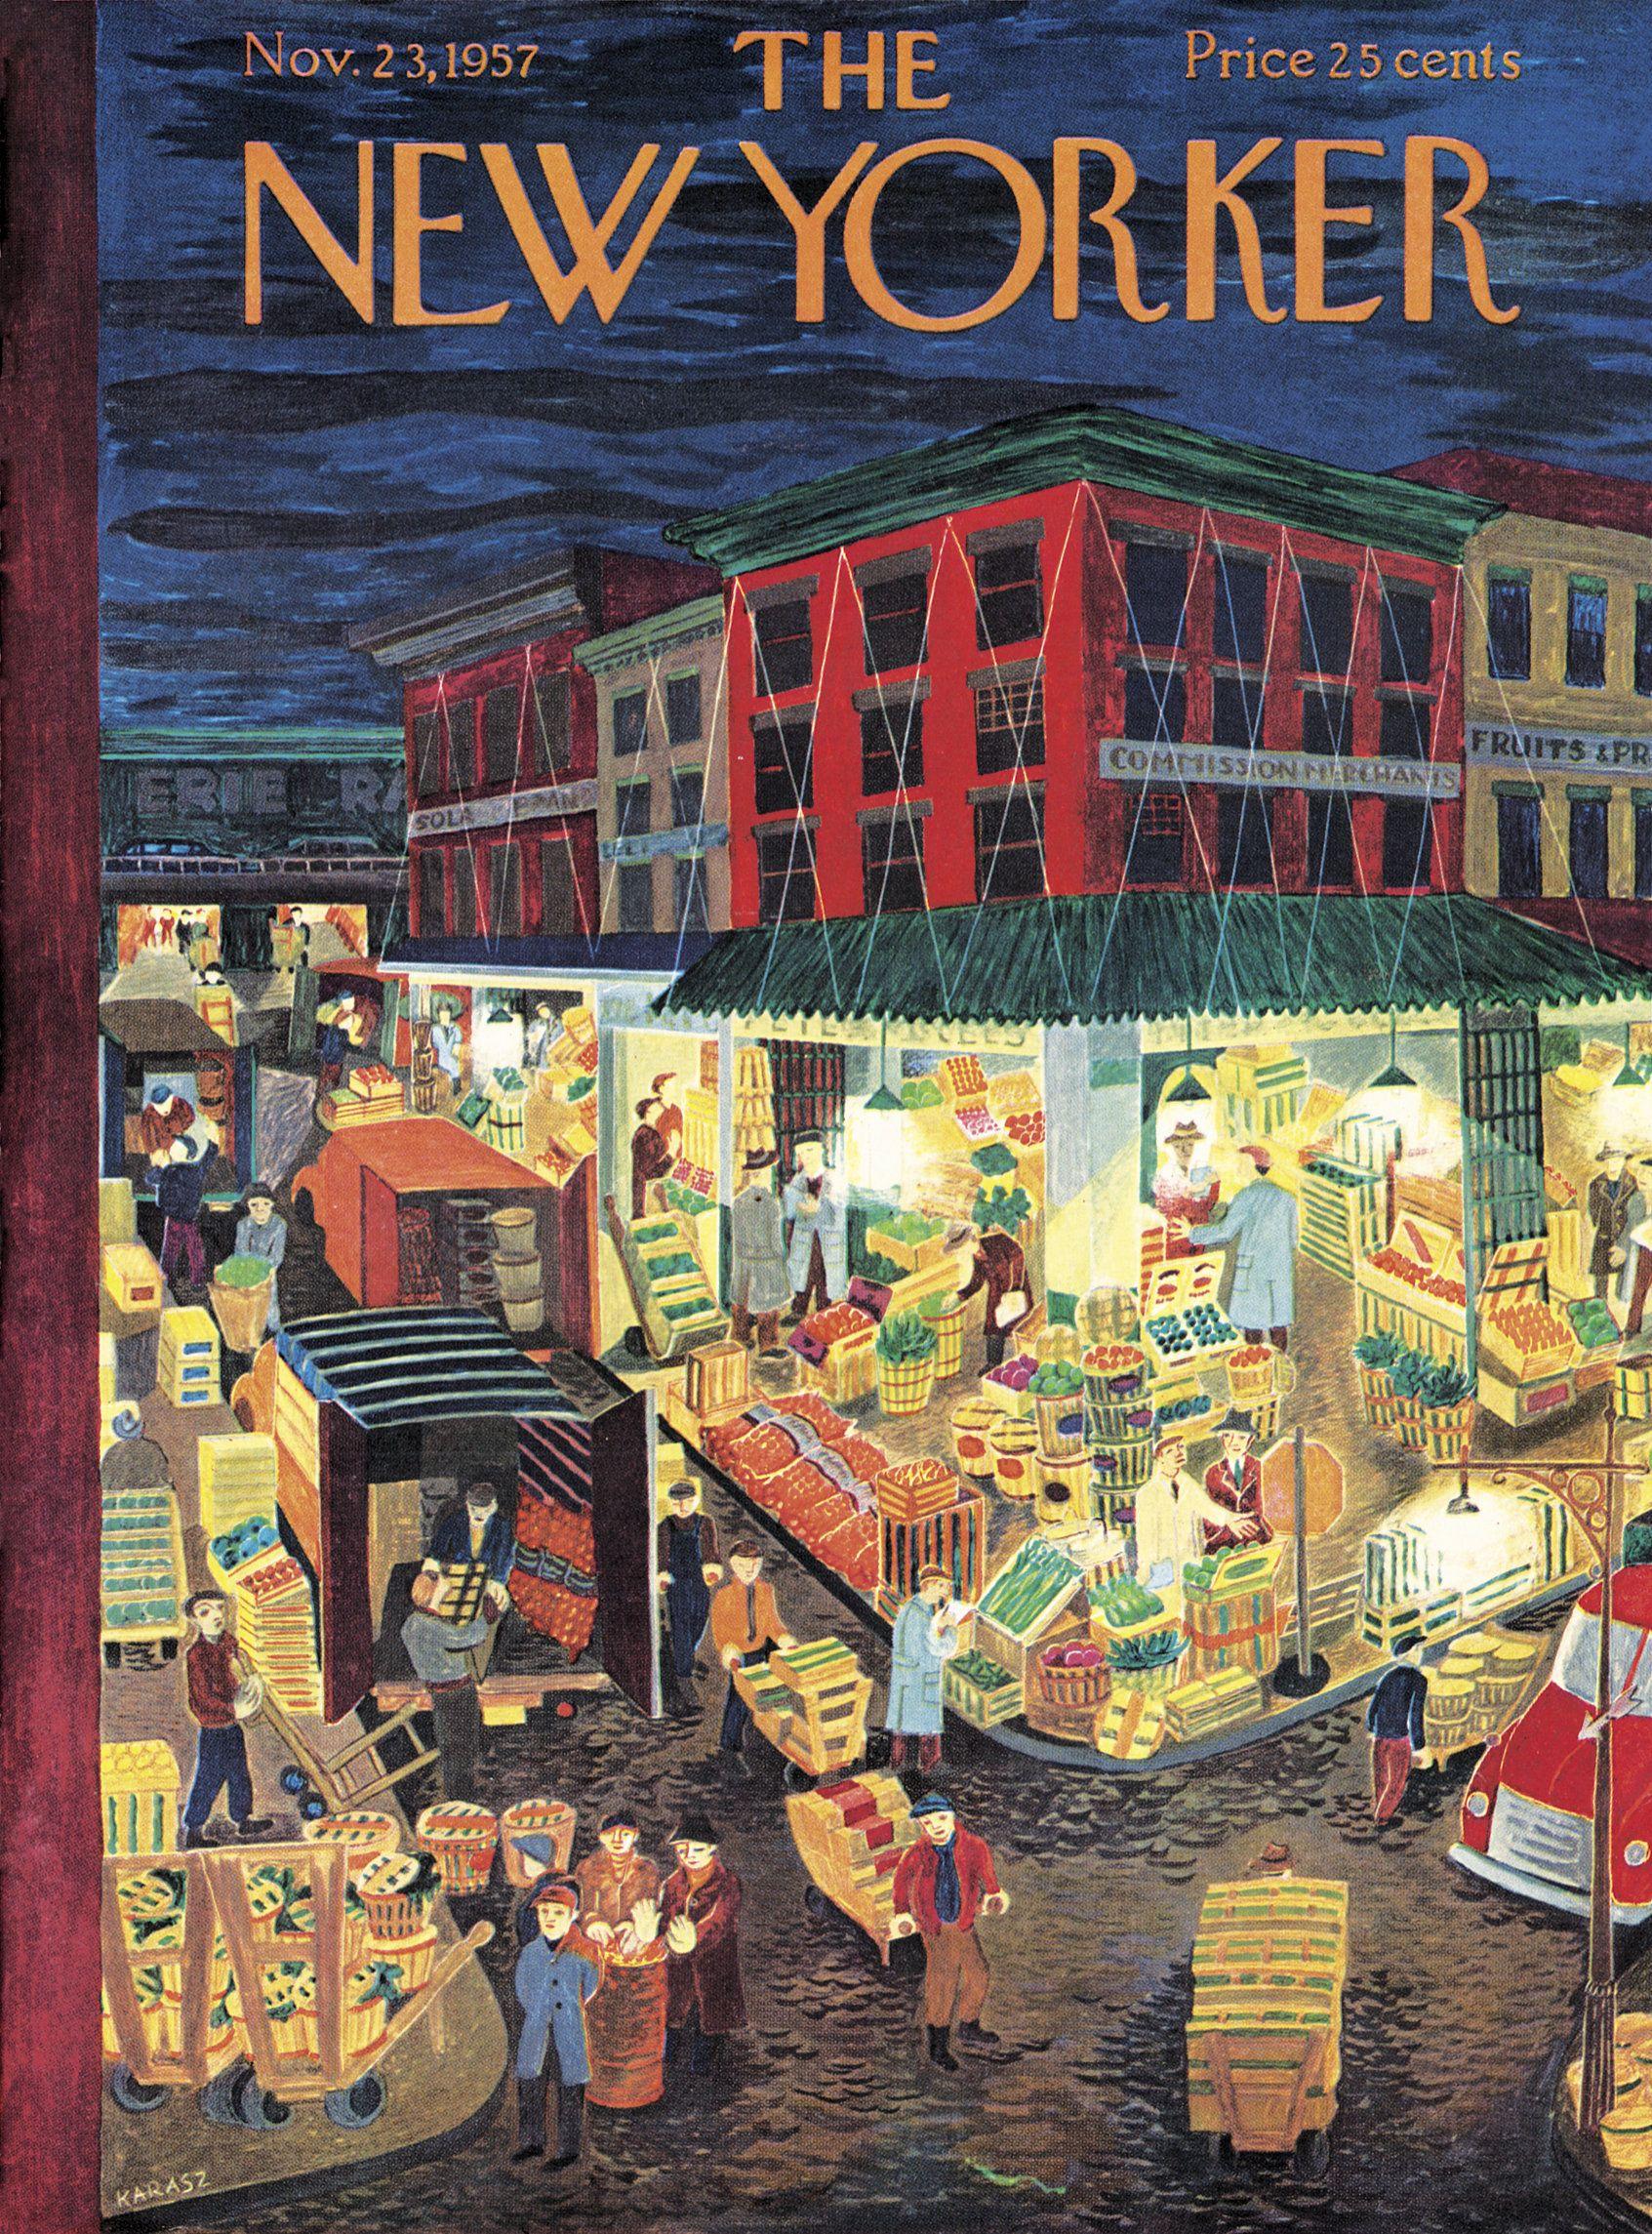 The New Yorker - Saturday, November 23, 1957 - Issue # 1710 - Vol. 33 - N° 40 - Cover by : Ilonka Karasz